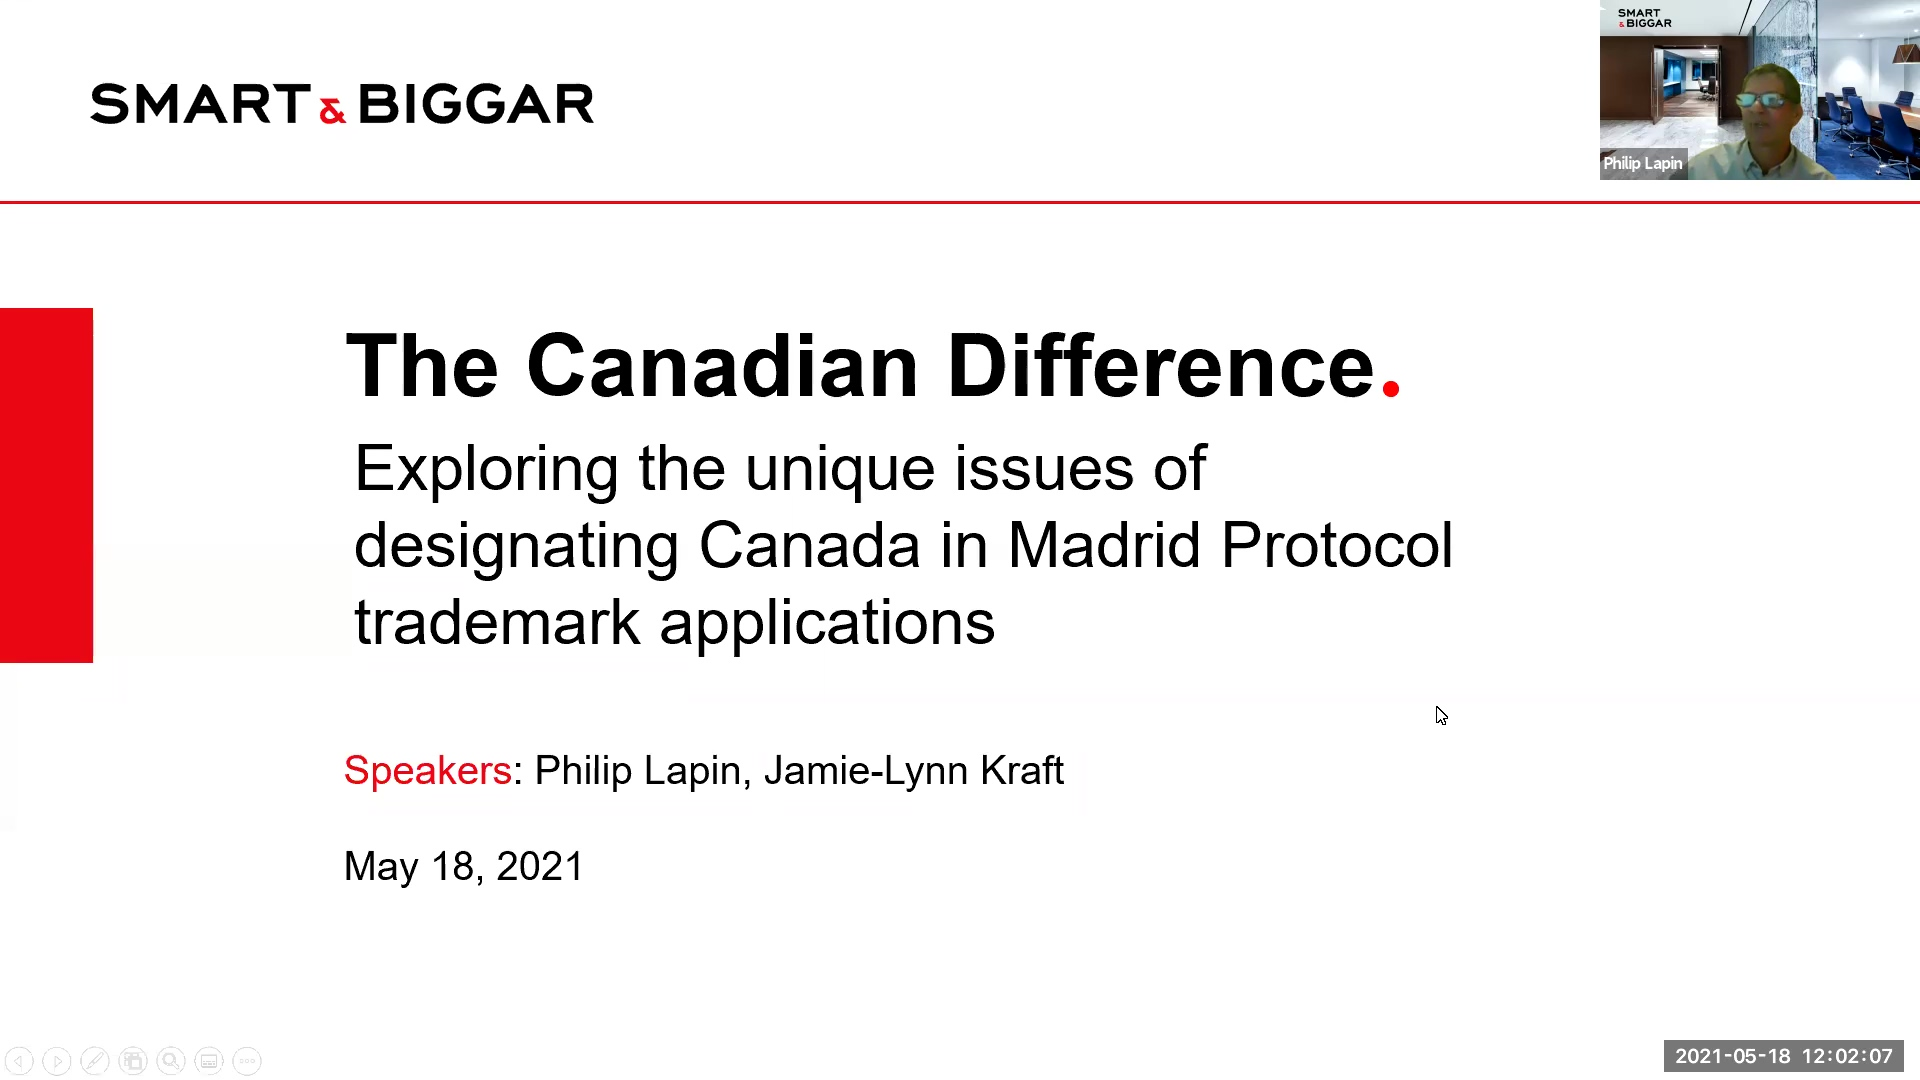 Designating Canada in Madrid Protocol trademark applications